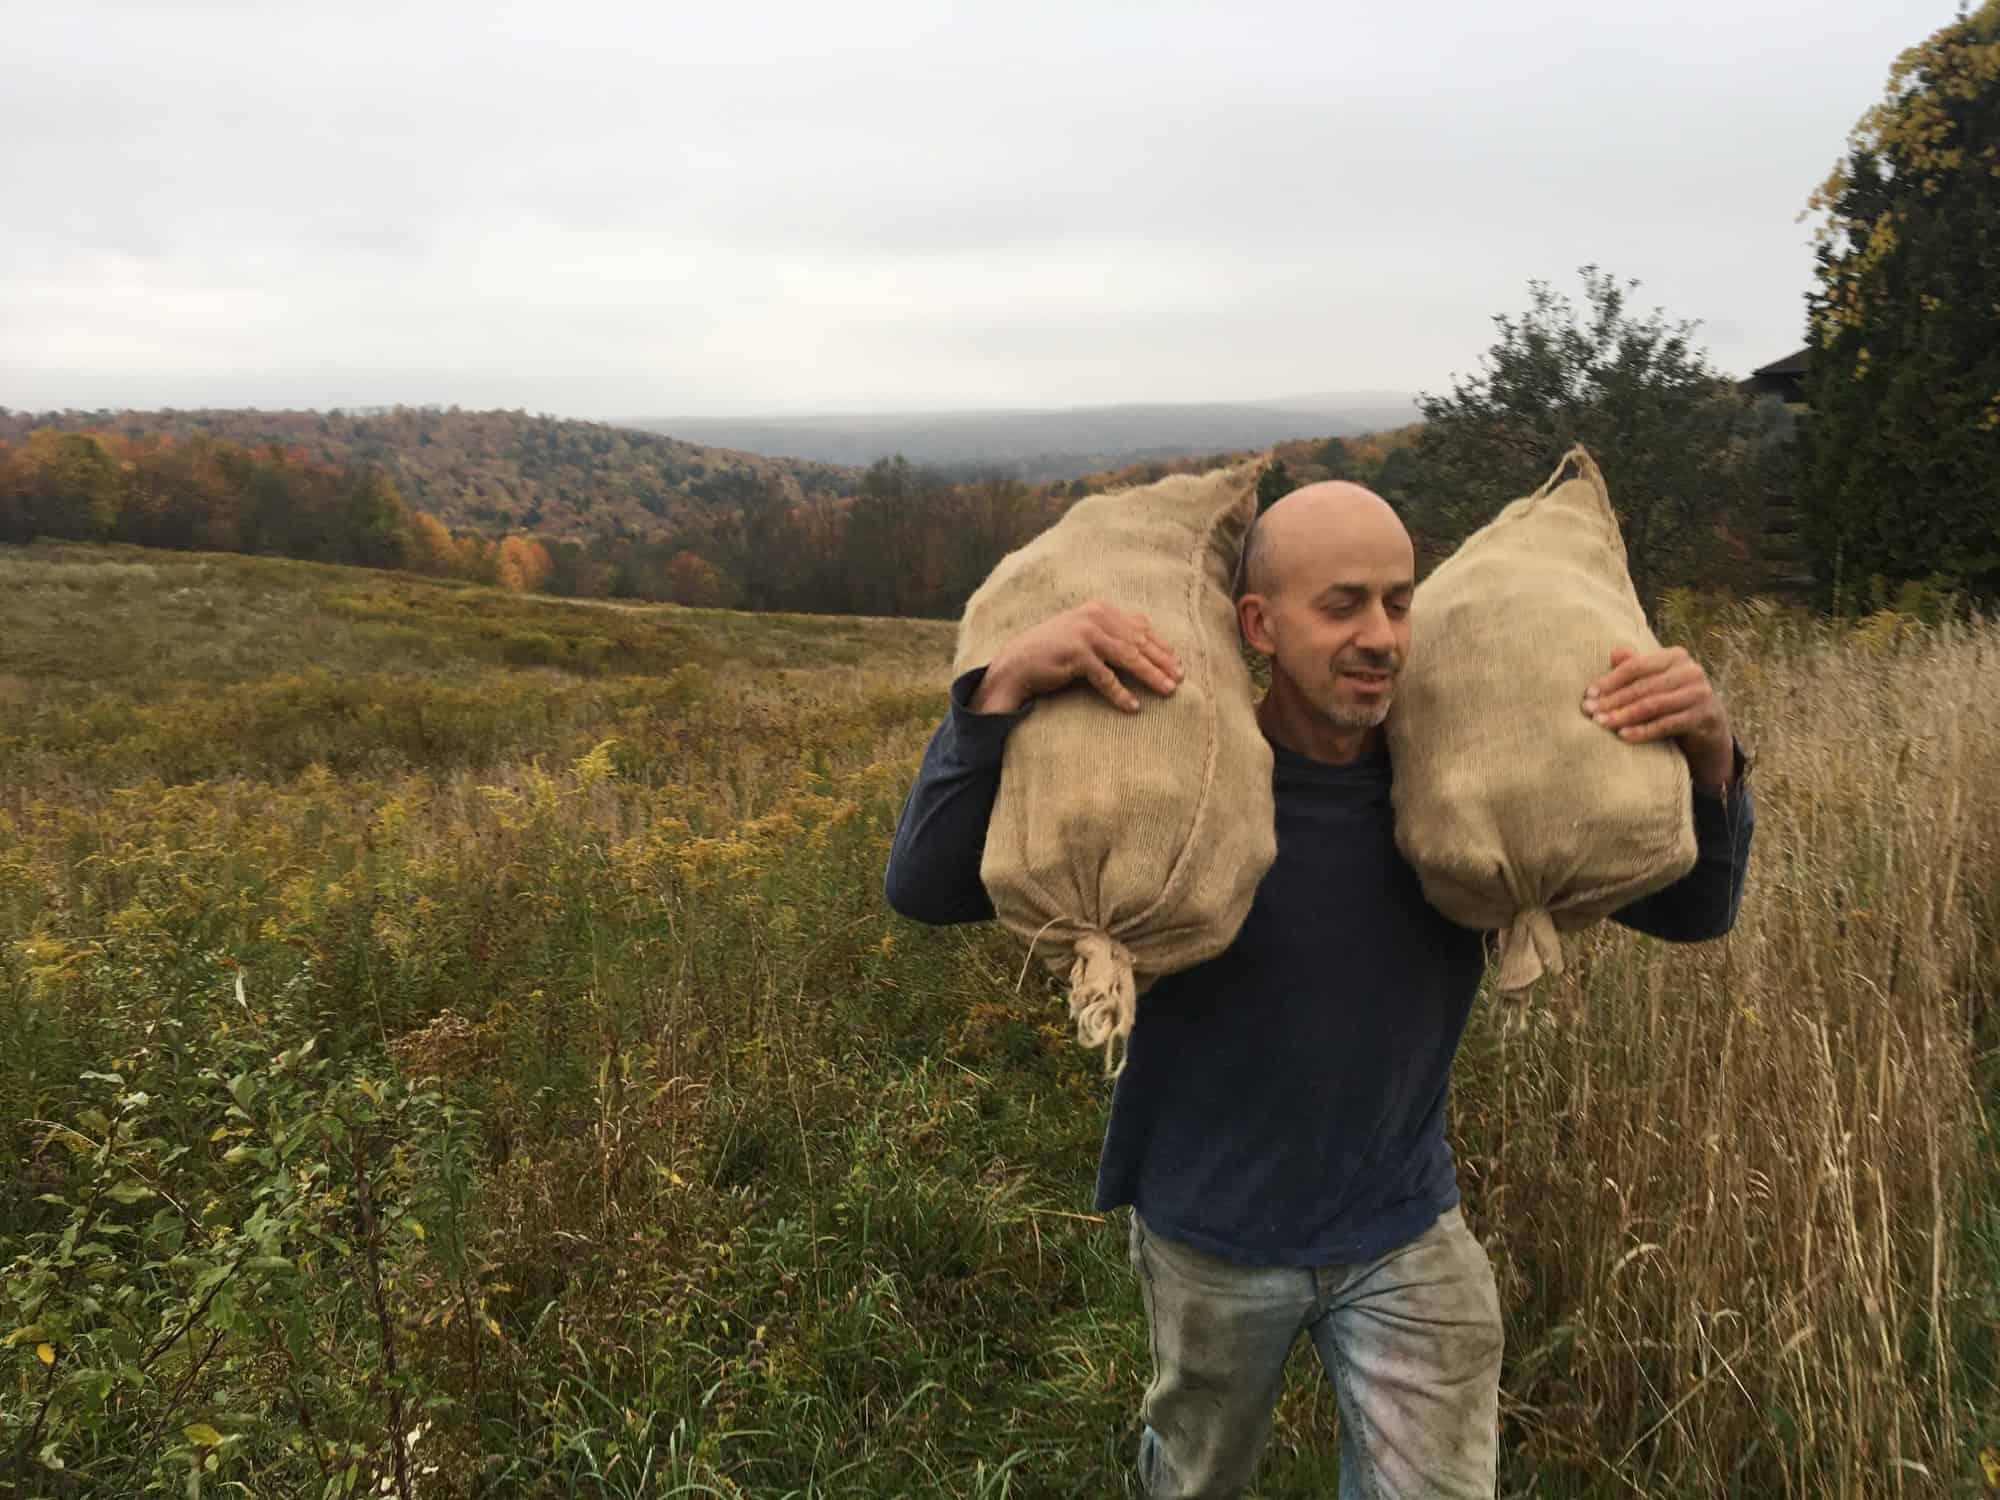 Hauling Wild Pears